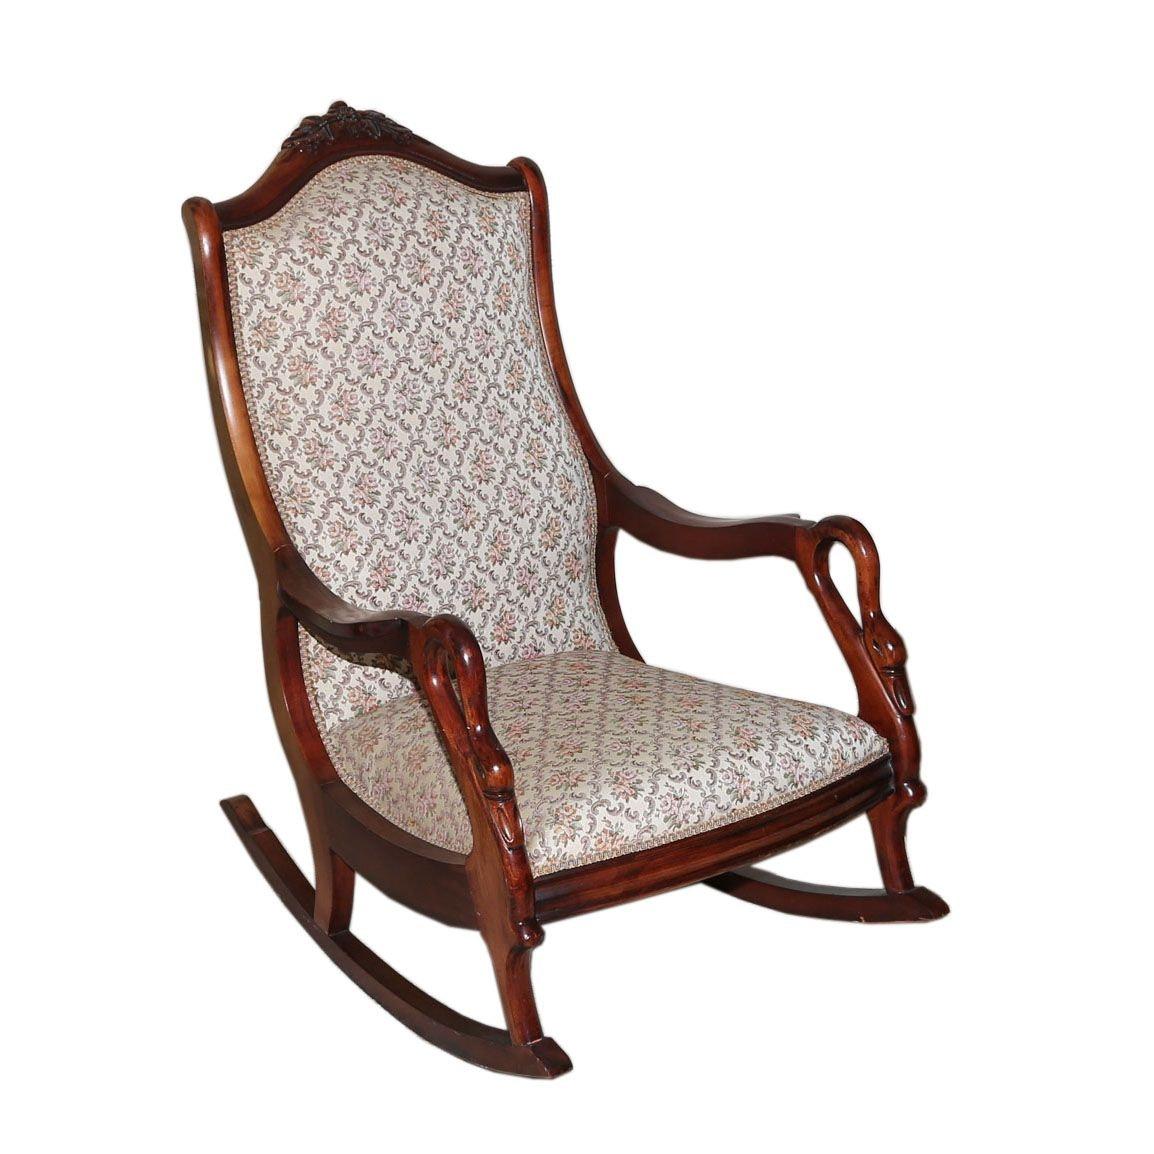 Walnut Gooseneck Rocking Chair, 20th Century